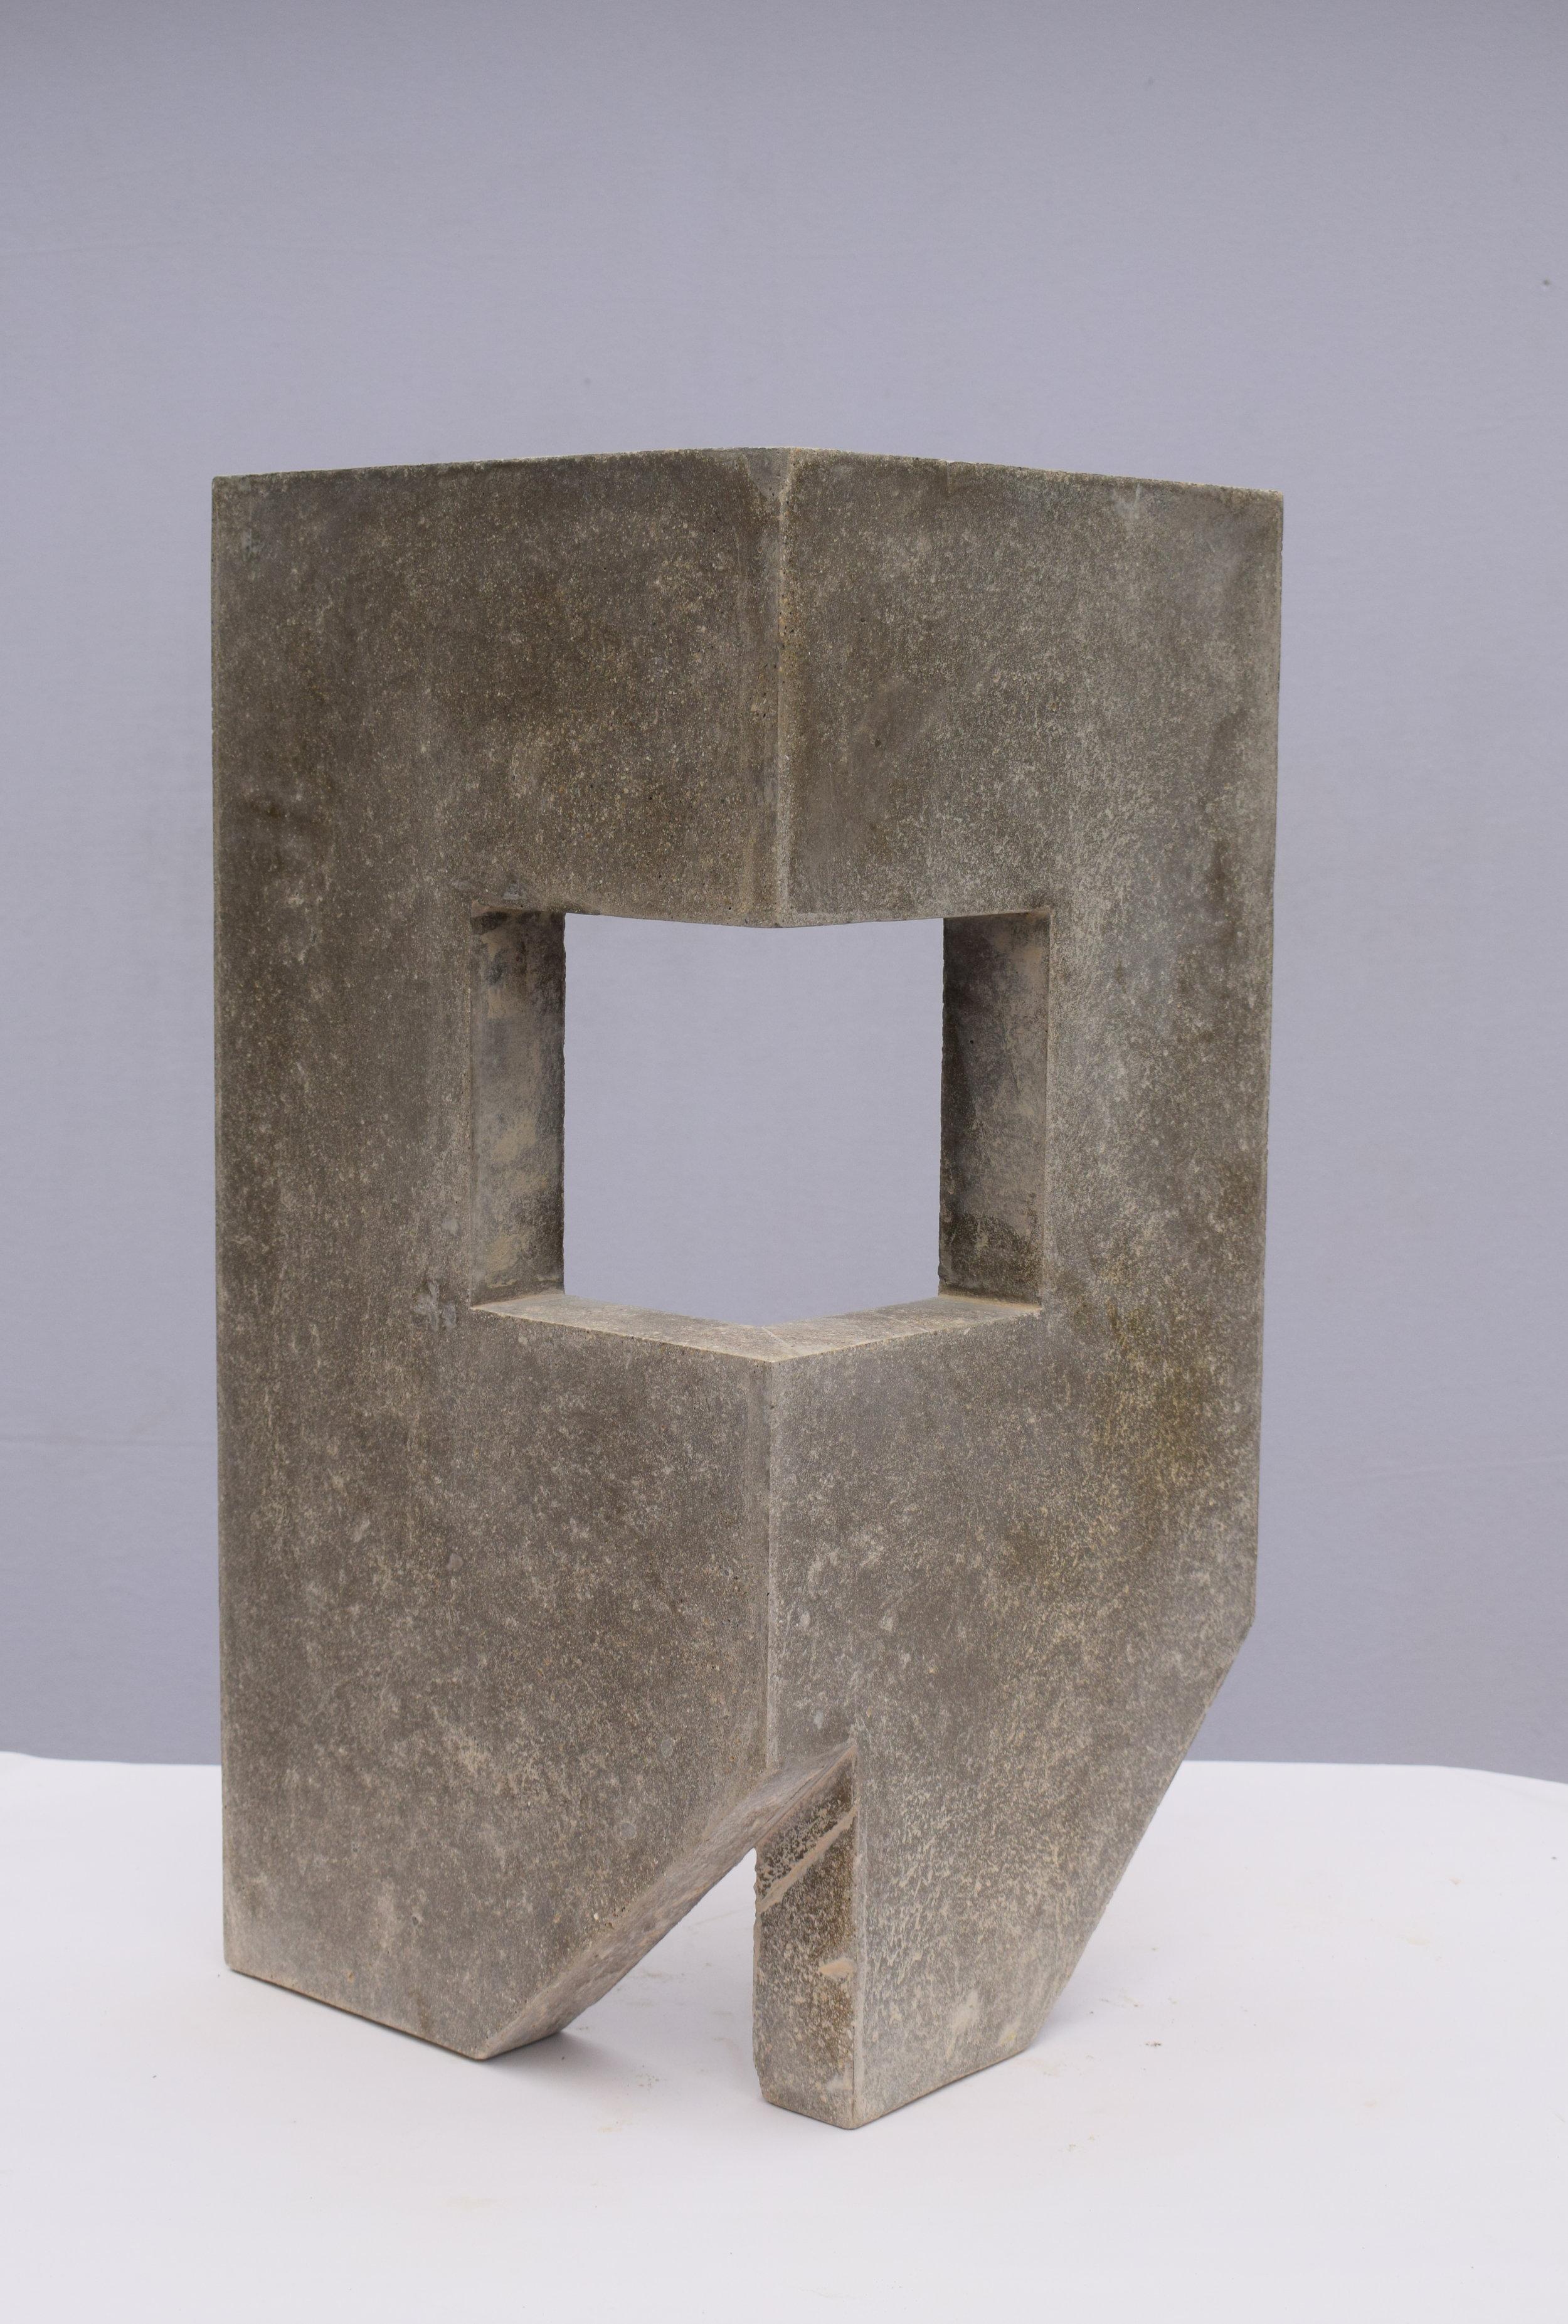 Sangar II (60 × 30 × 30 cm)